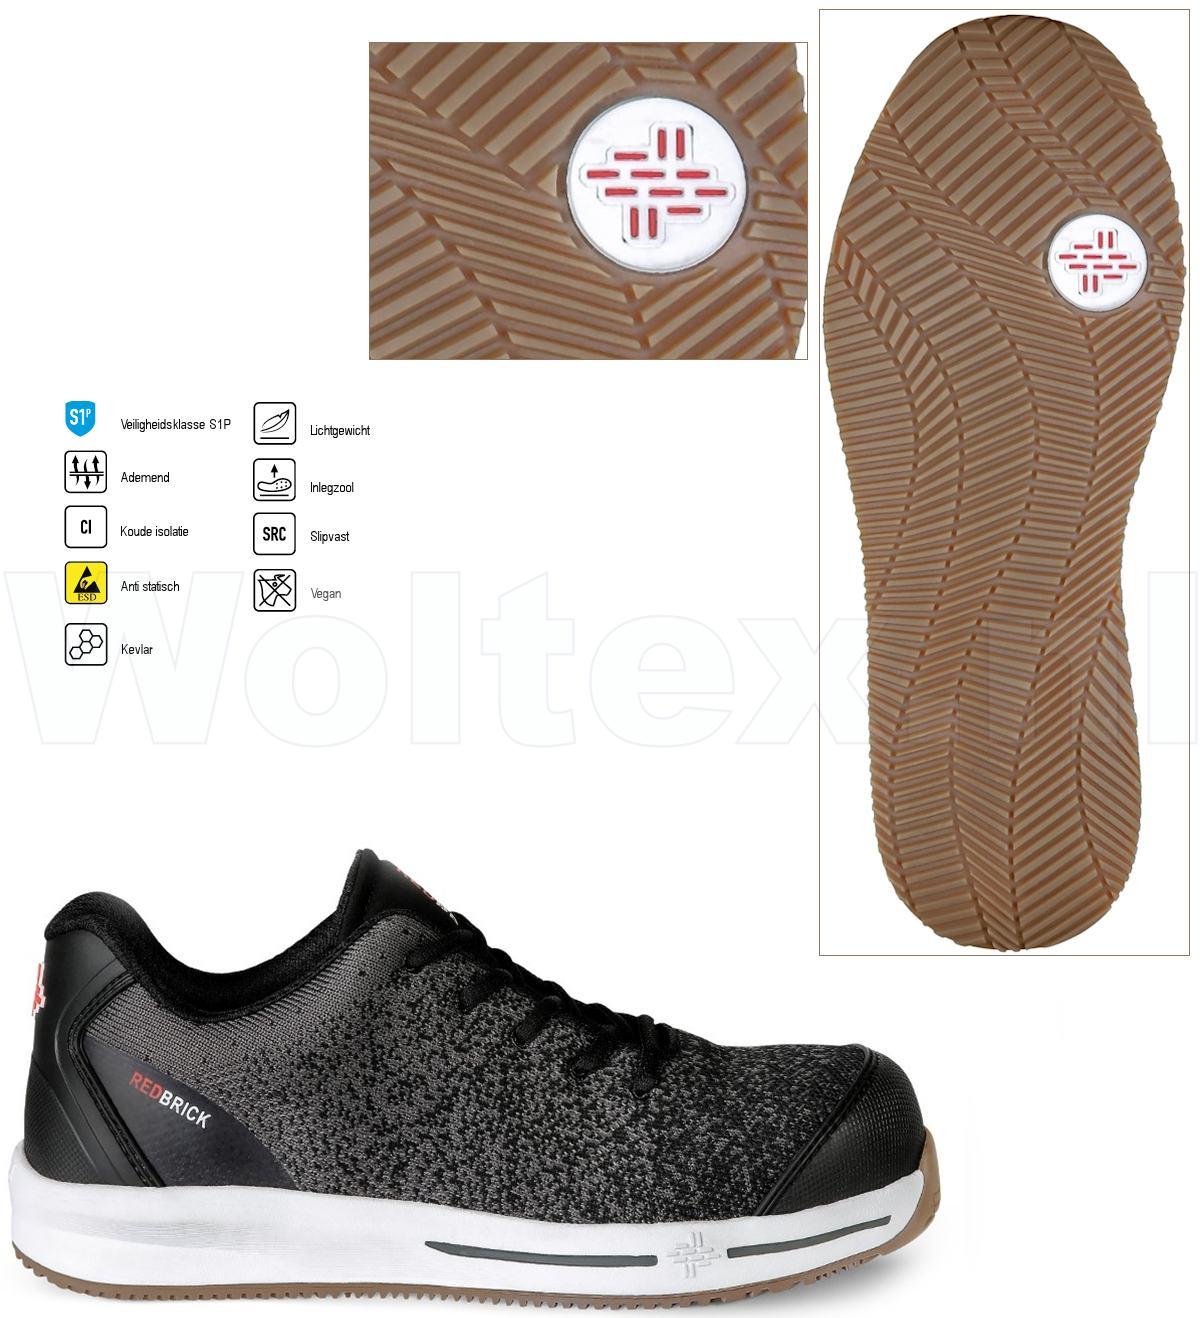 Werkschoenen Dames Beveiliging.Redbrick Safety Sneakers Motion S1p Esd Werkschoenen Agile